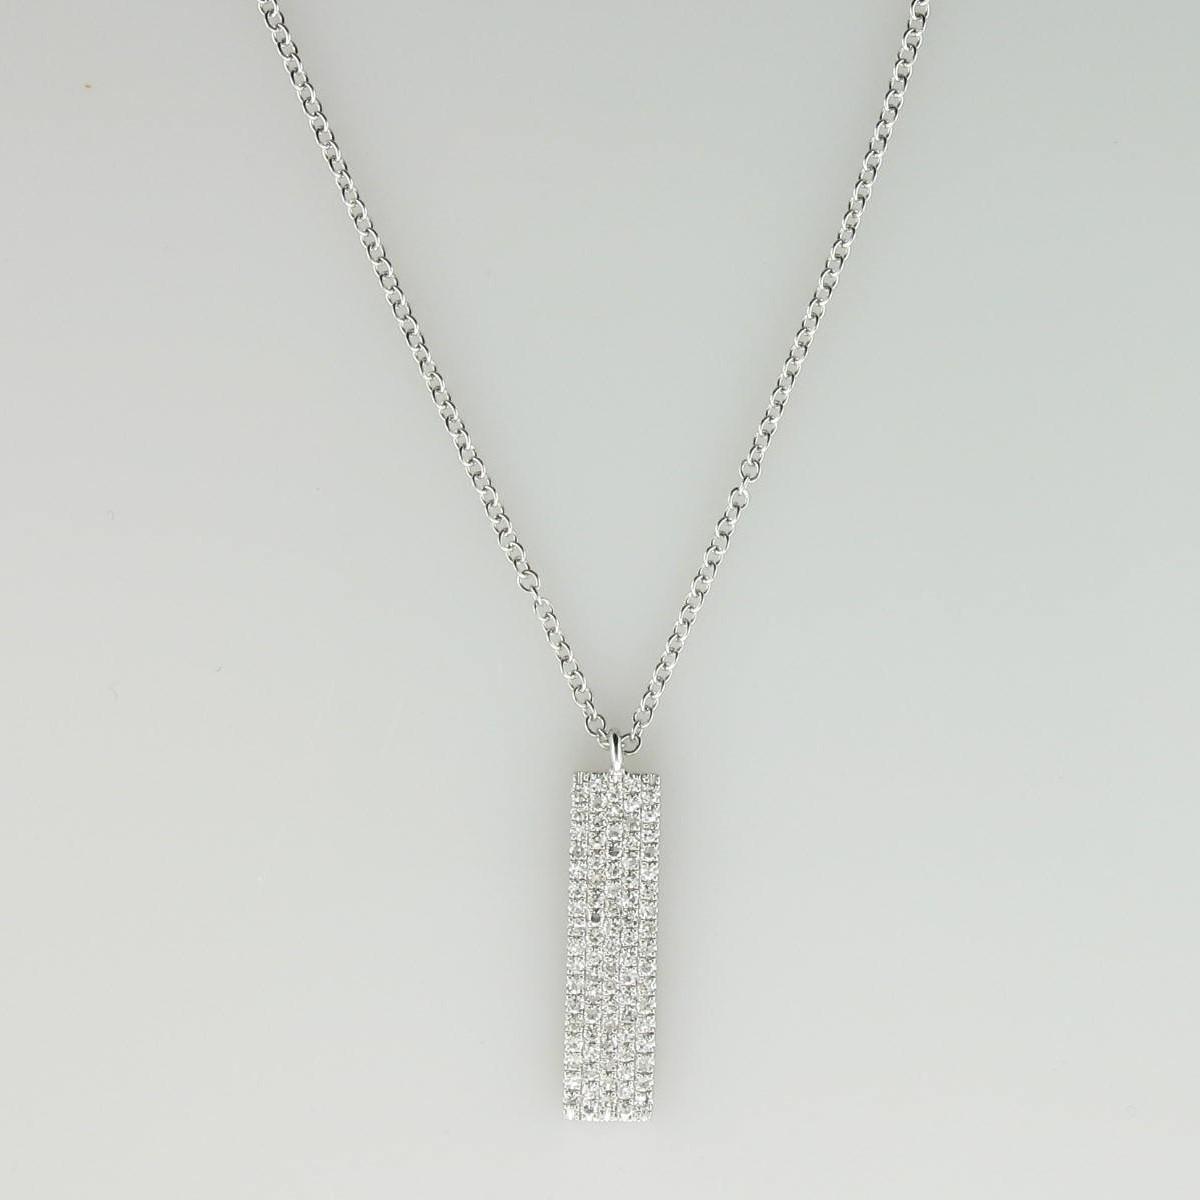 658c84cafd986b 0.25tcw Diamond Vertical Bar set in 14k White Gold. $599.00. 0.37ct  Princess Diamond Pendant ...